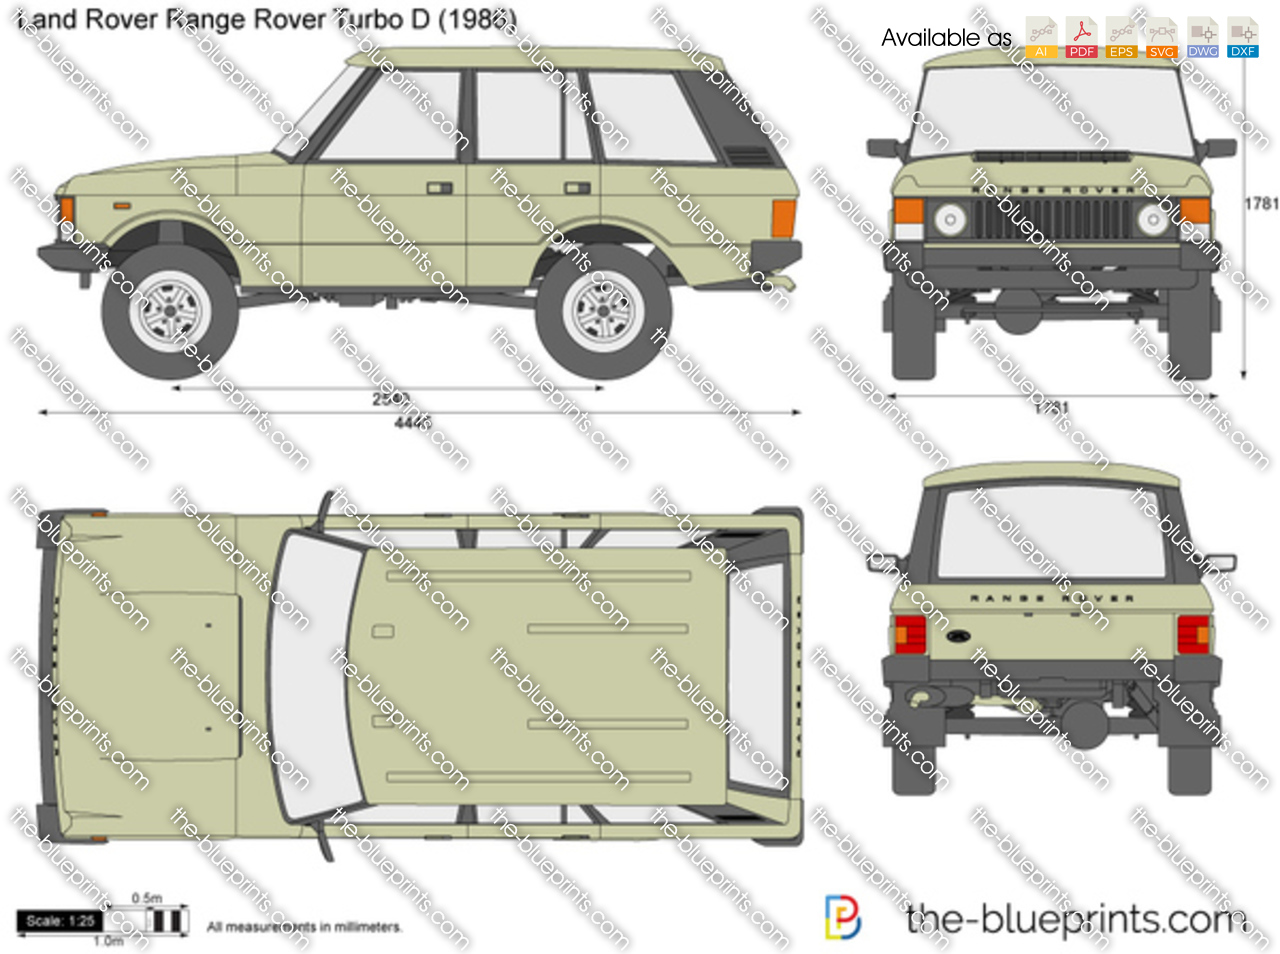 Land Rover Range Rover Turbo D